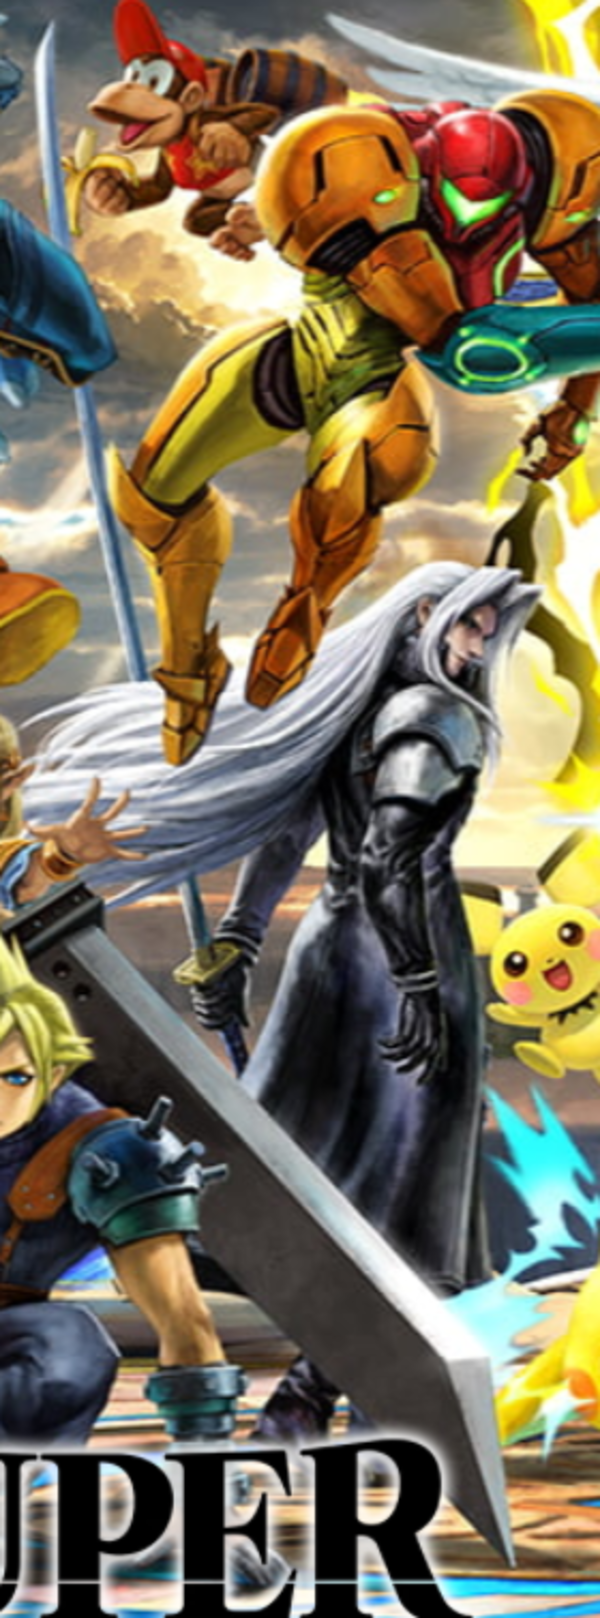 Sephiroth Alternate Colors Skins Click On Image To Enlarge Super Smash Brothers Ultimate Super Smash Brothers Sephiroth Smash Brothers